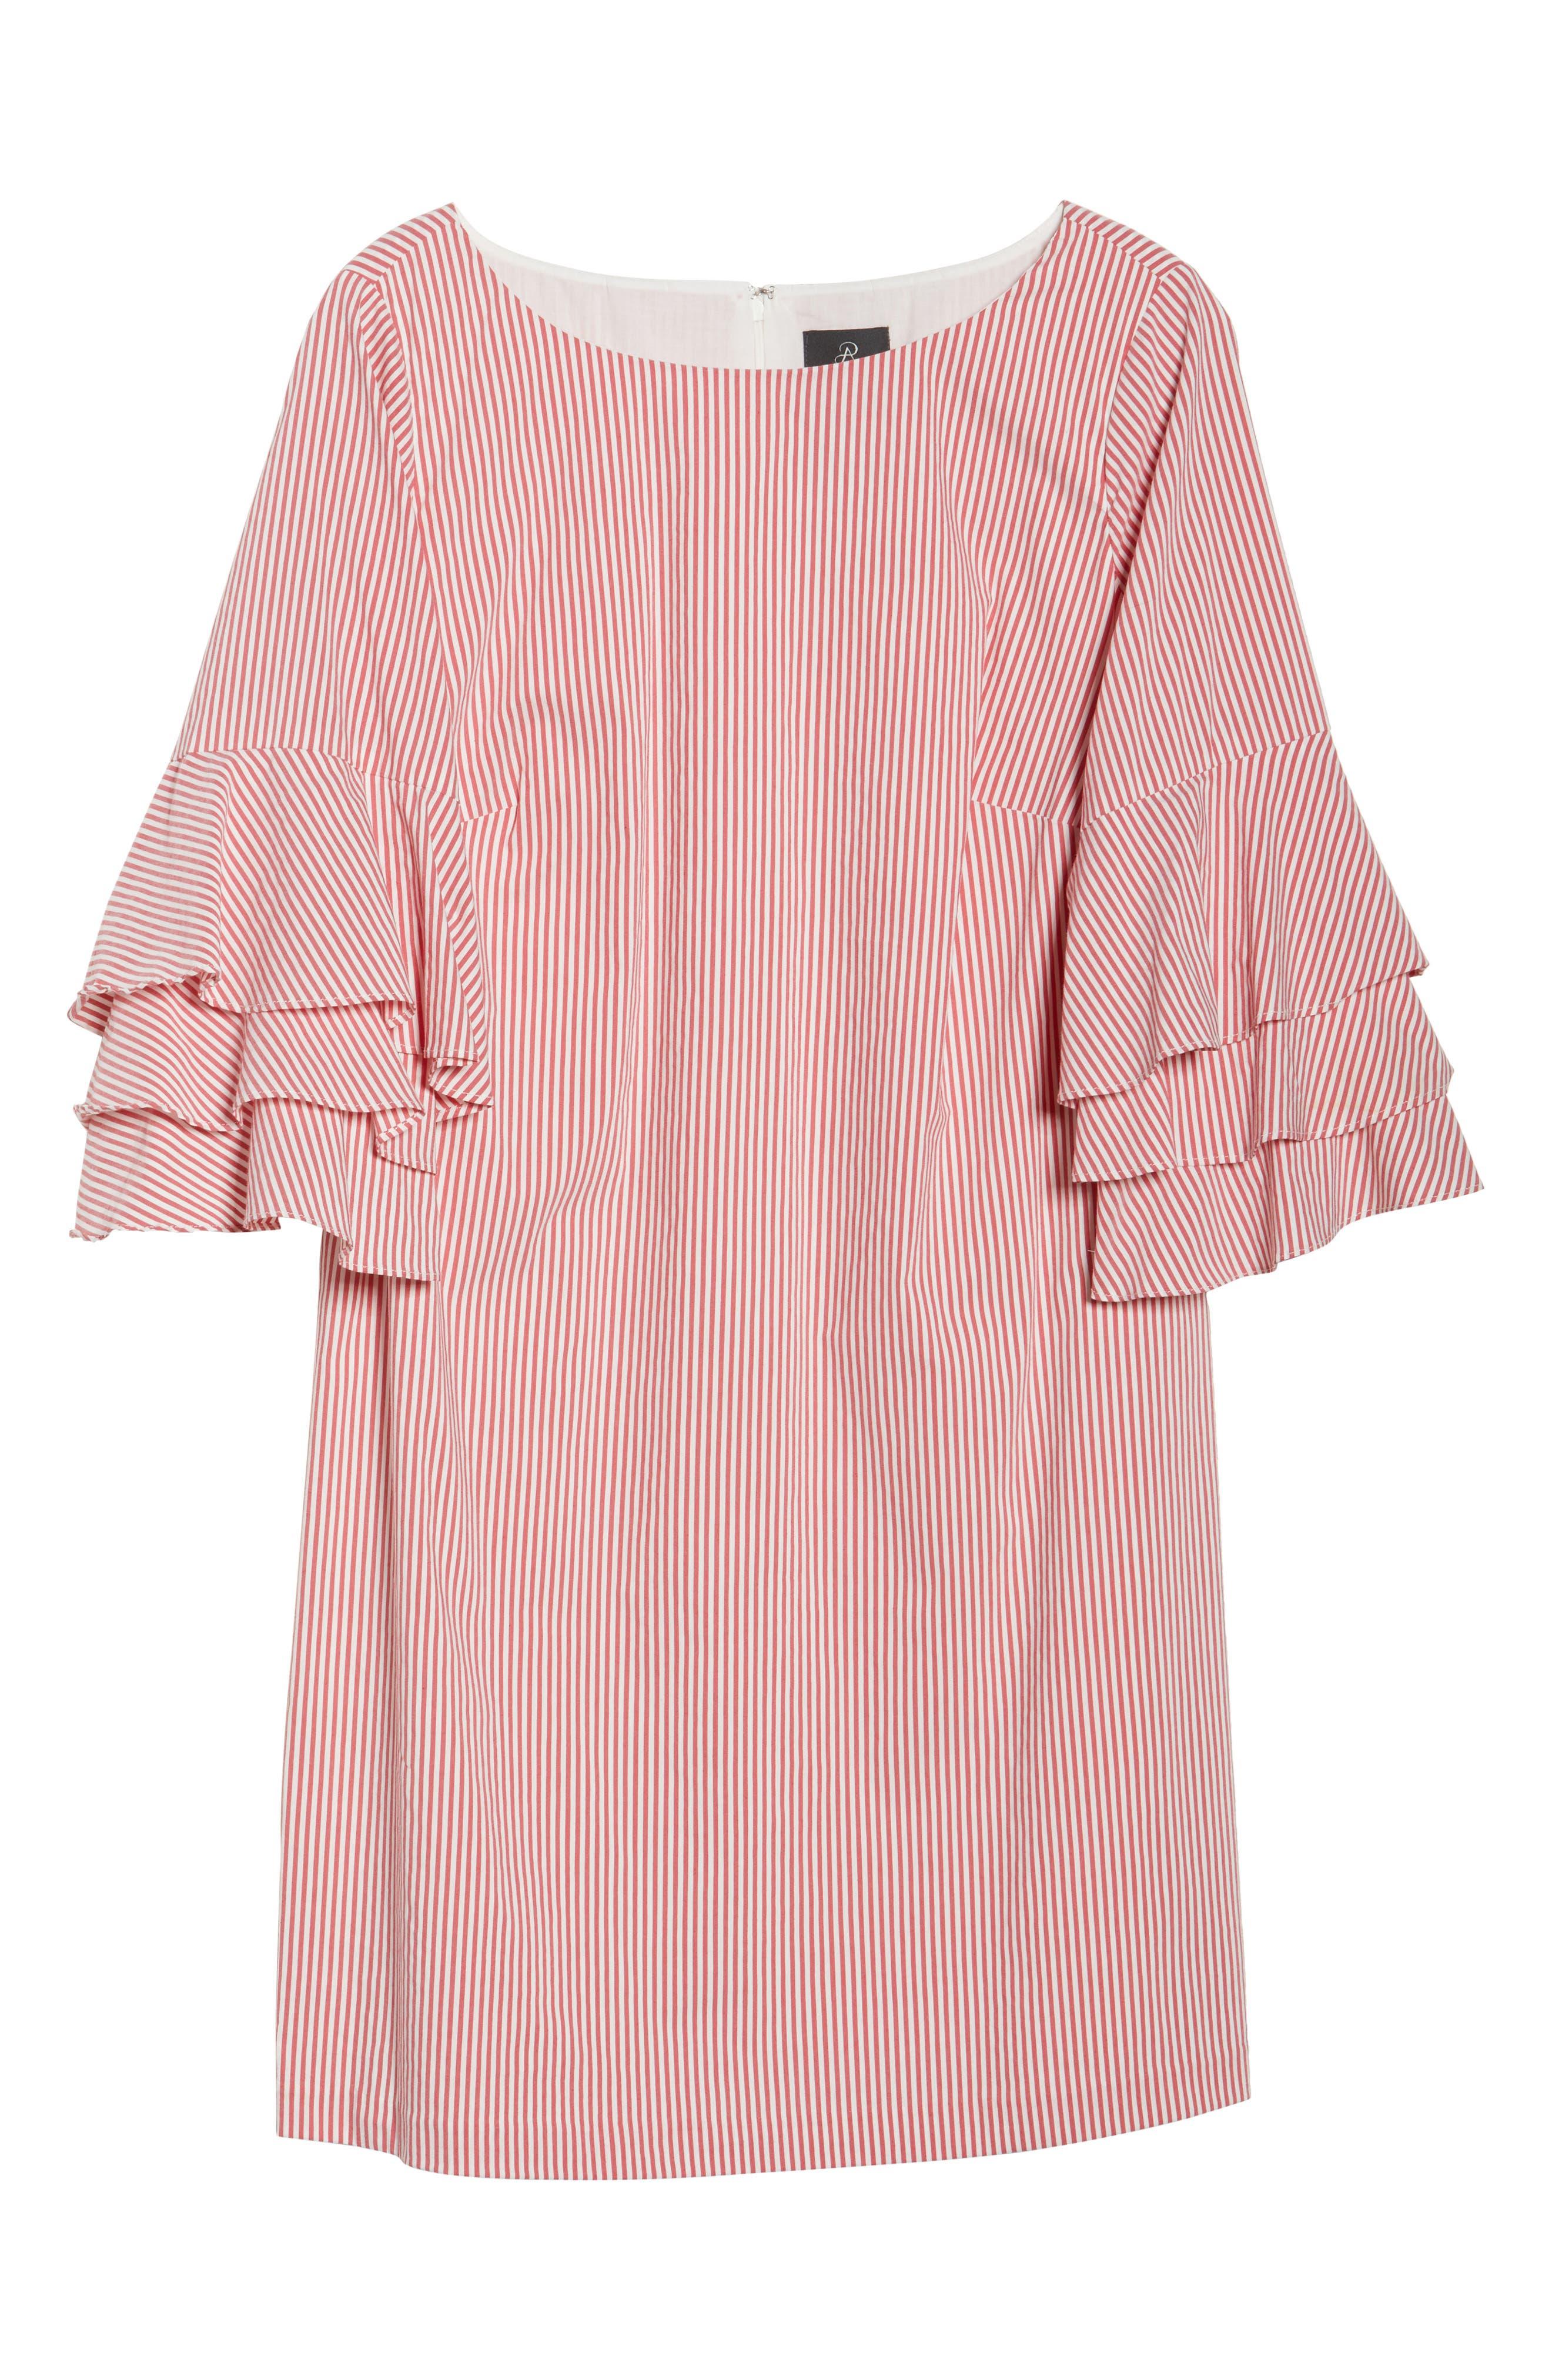 Ruffle Sleeve Stripe Shift Dress,                             Alternate thumbnail 6, color,                             Red/ White